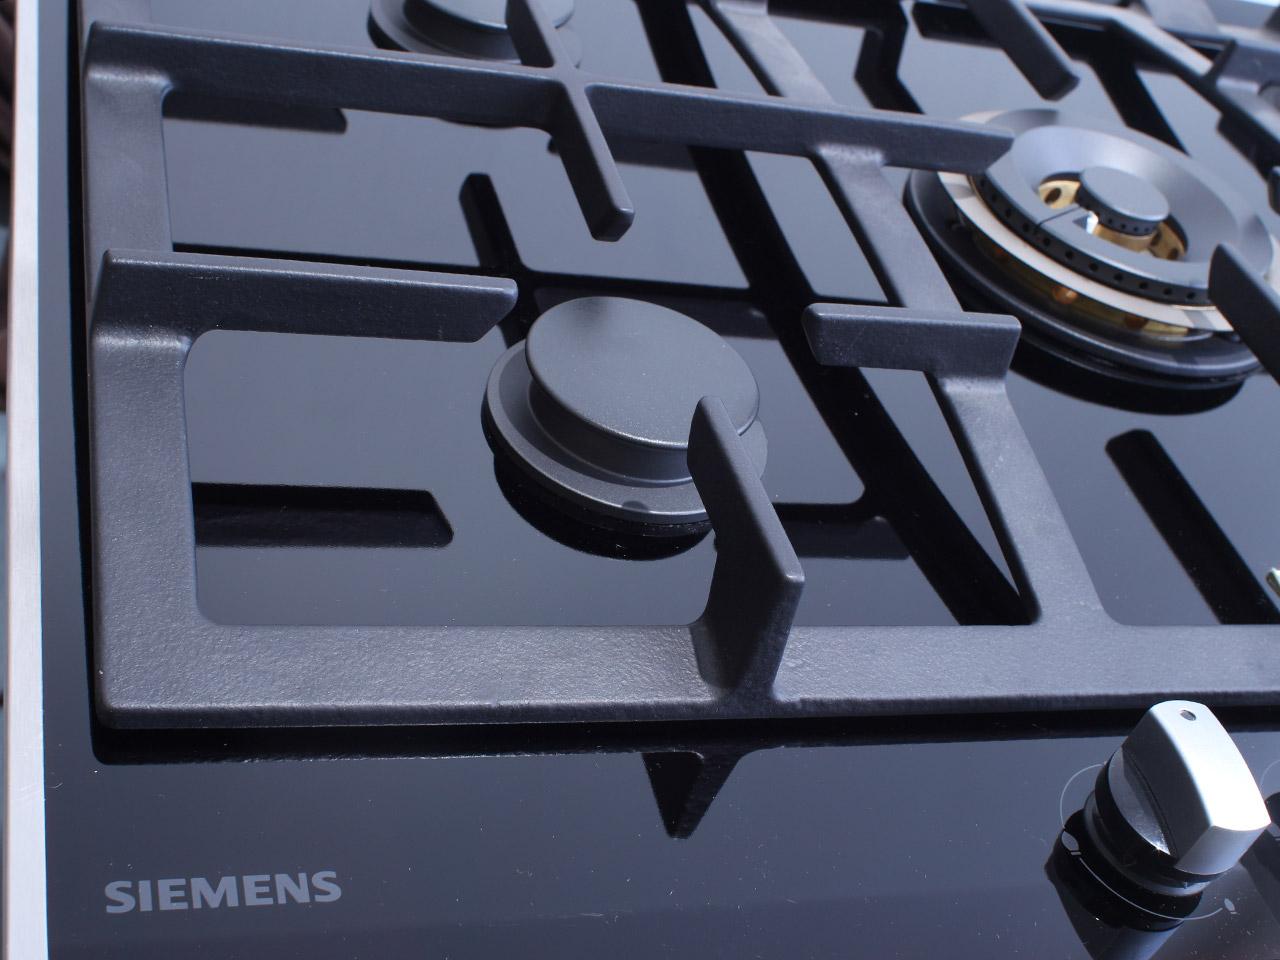 siemens kochfeld gas 70 cm autark 5 flammig glaskeramik gaskochfeld er747501e. Black Bedroom Furniture Sets. Home Design Ideas